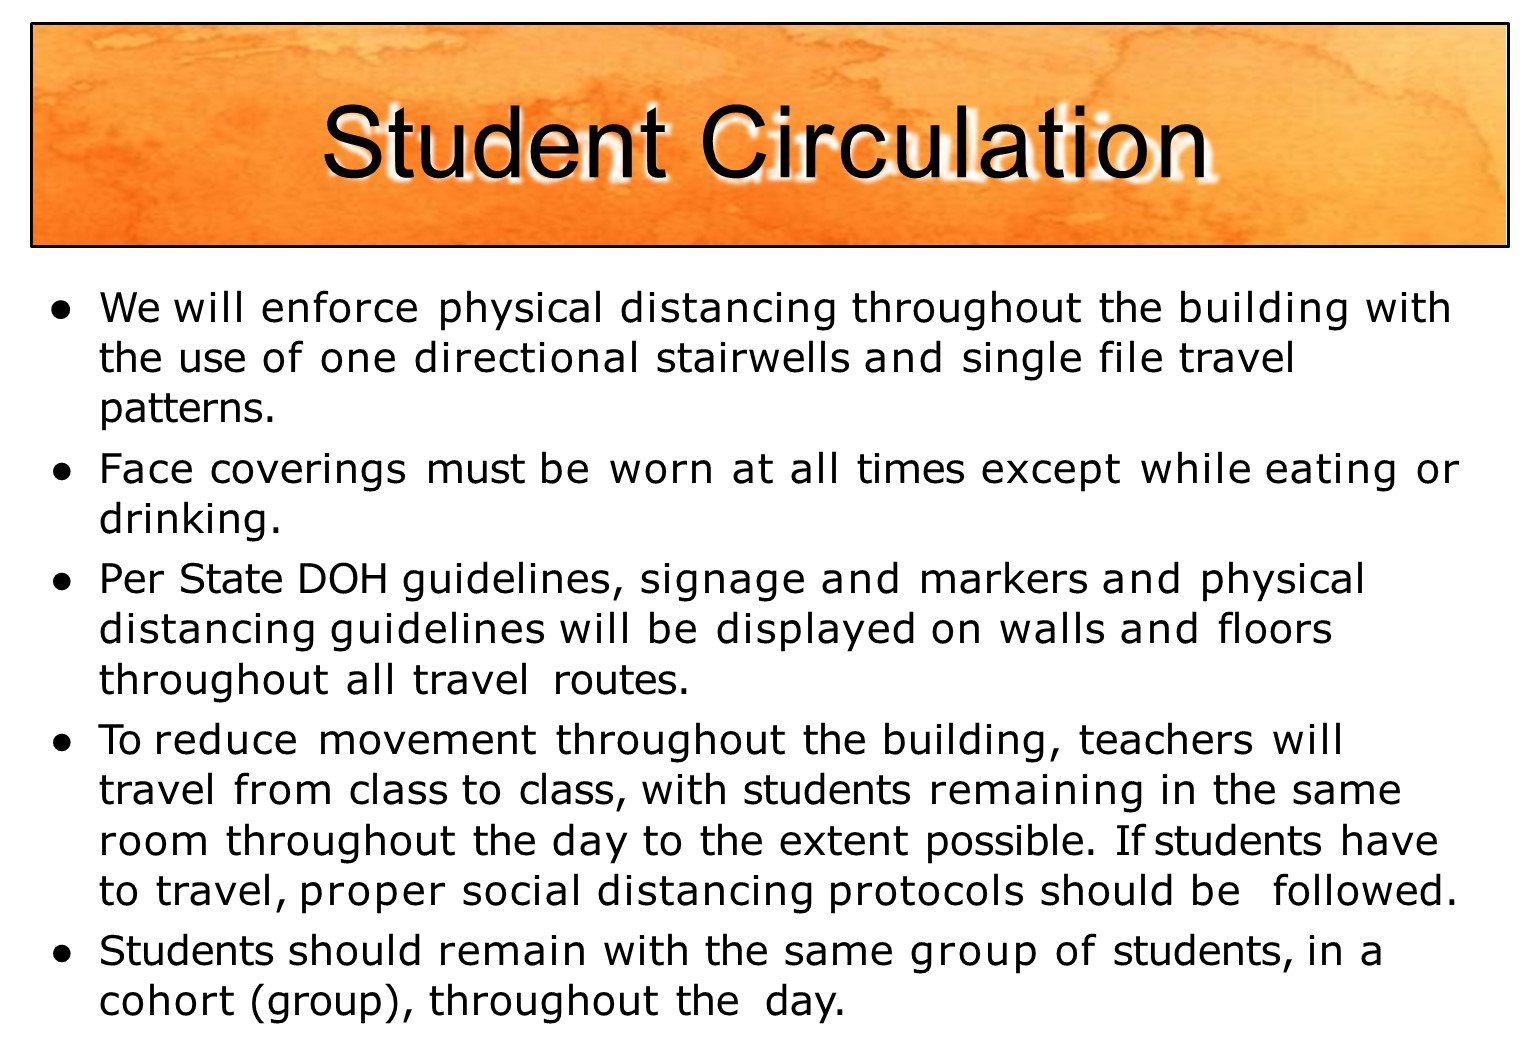 Student movement in school